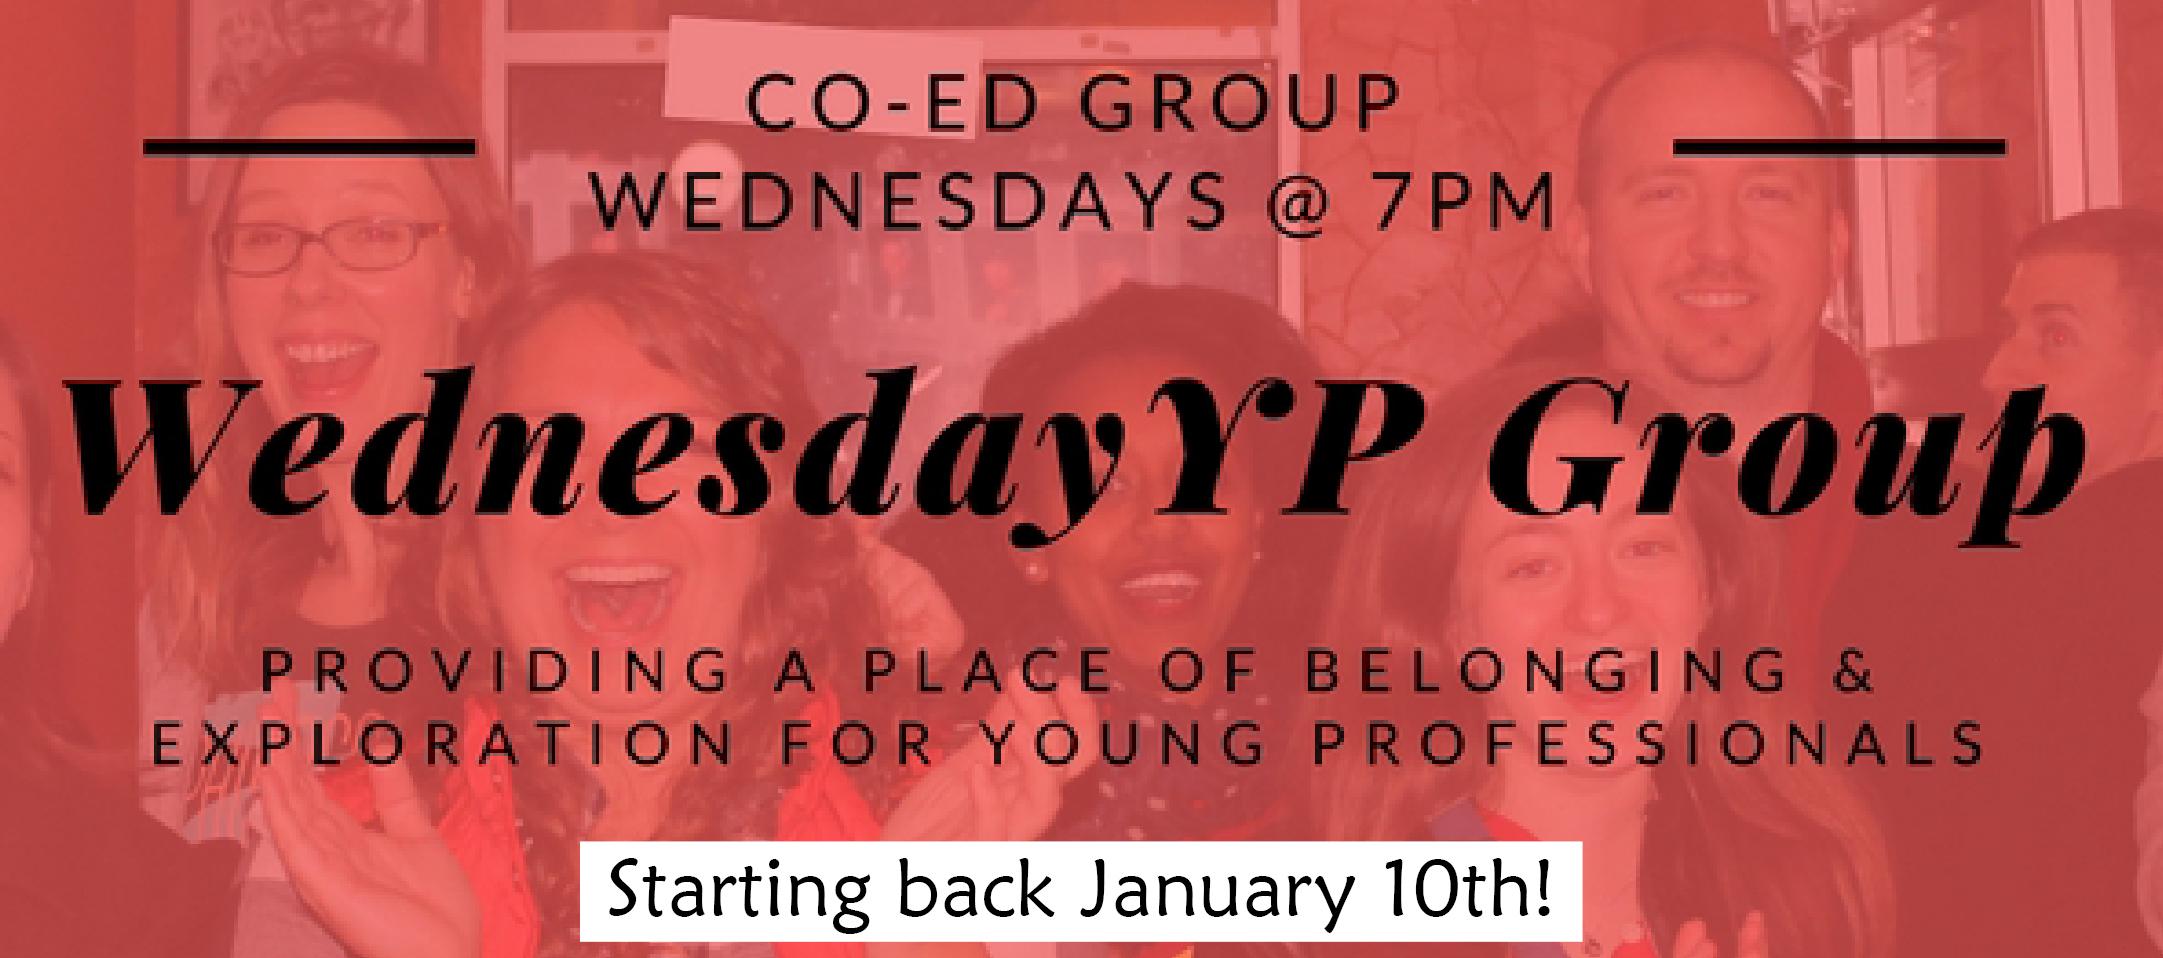 Wednesday YP Back.jpg